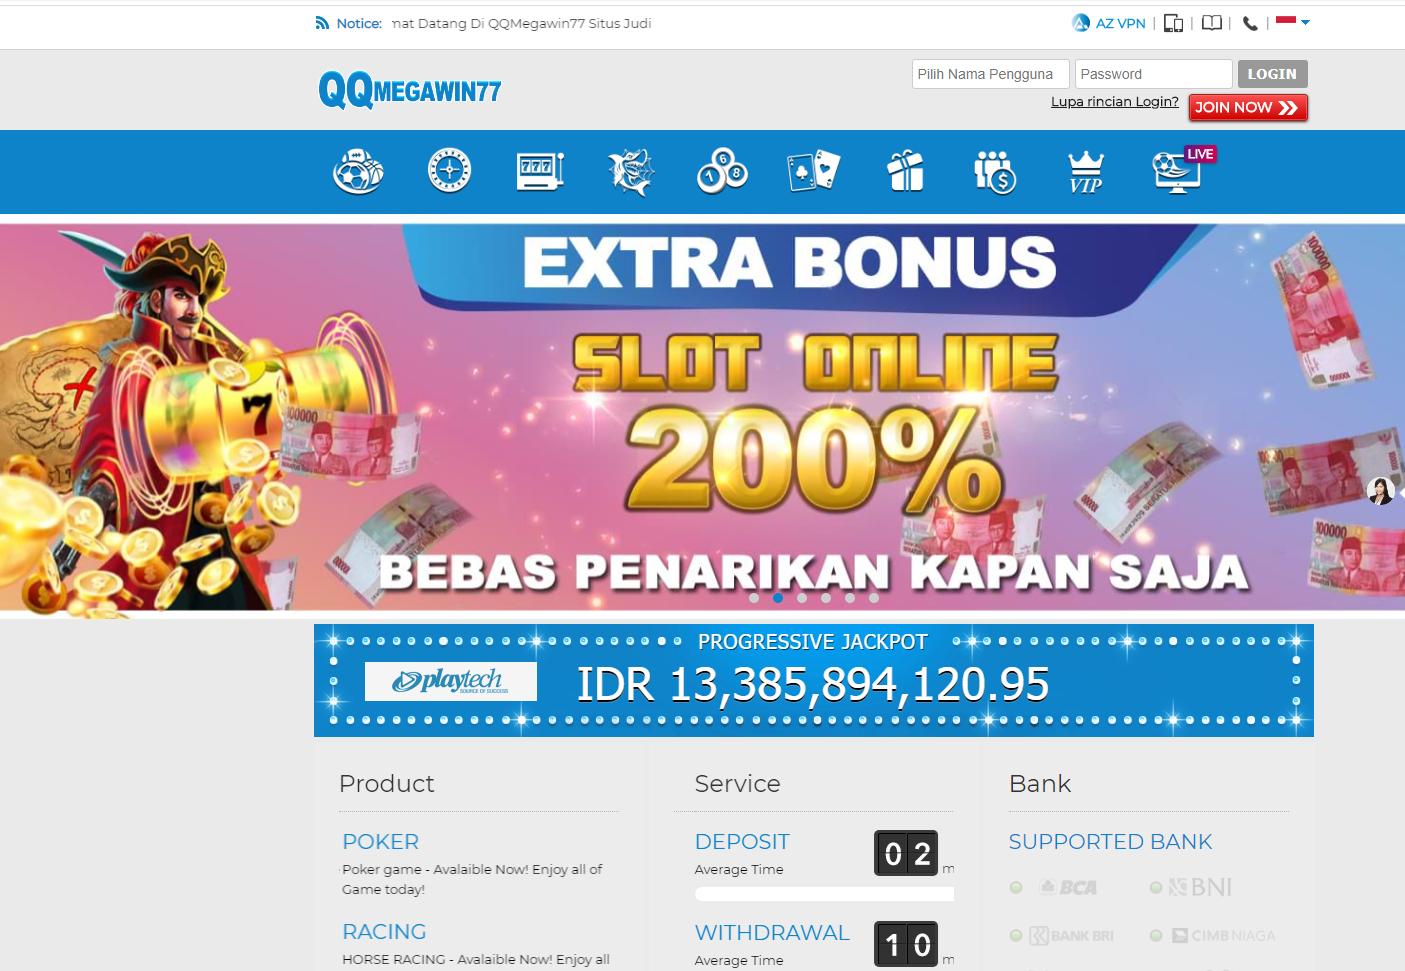 Qqmegawin77 Situs Judi Slot Online Qq Terpercaya Profile Lesser Spotted Football Forum